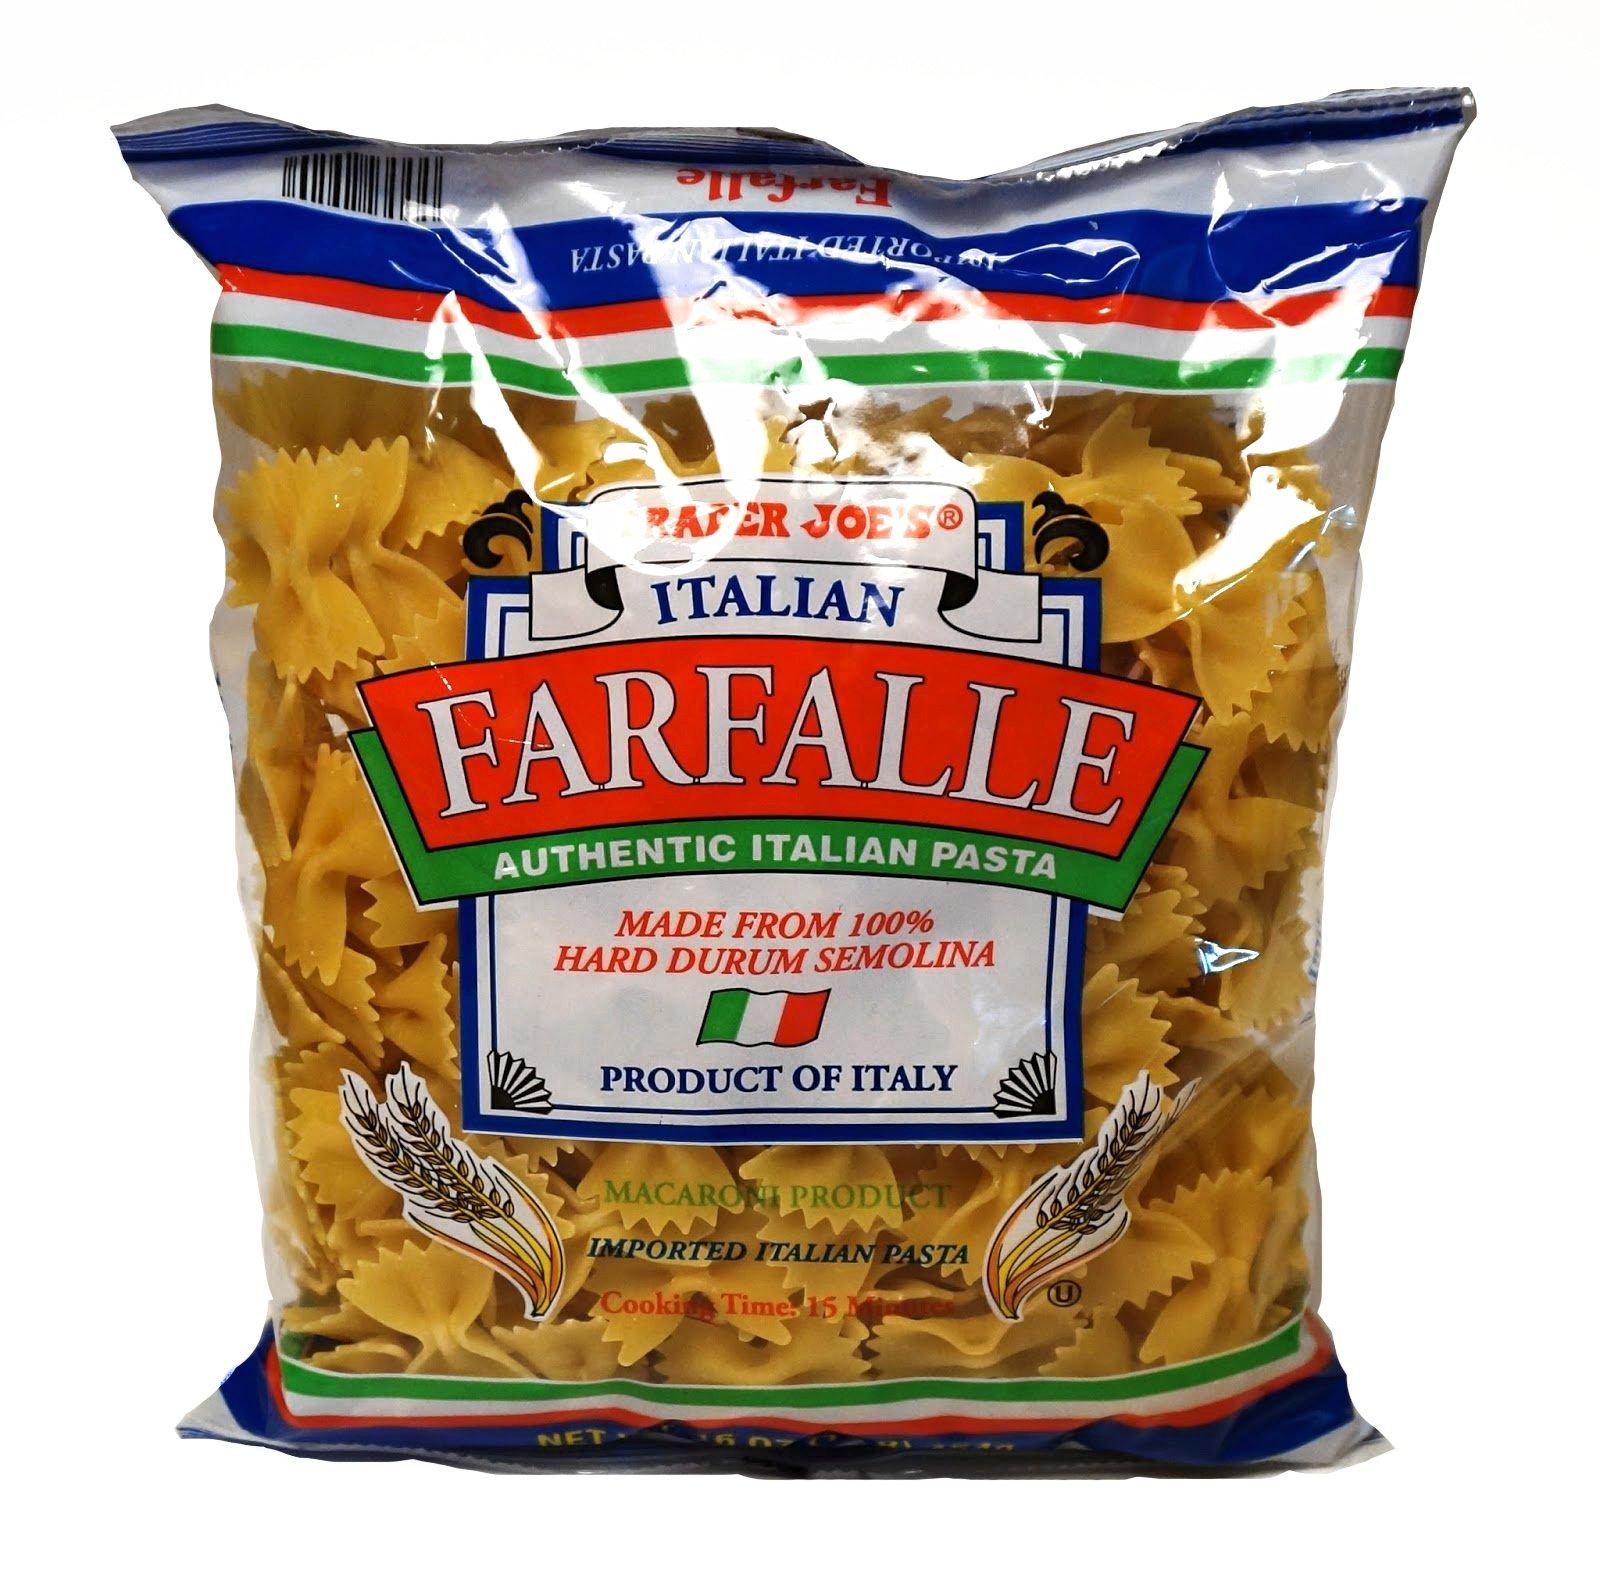 Trader Joe's Authentic Italian Farfalle Bow Tie Pasta 100% Durum Semolina - 1 lb (16 oz.)